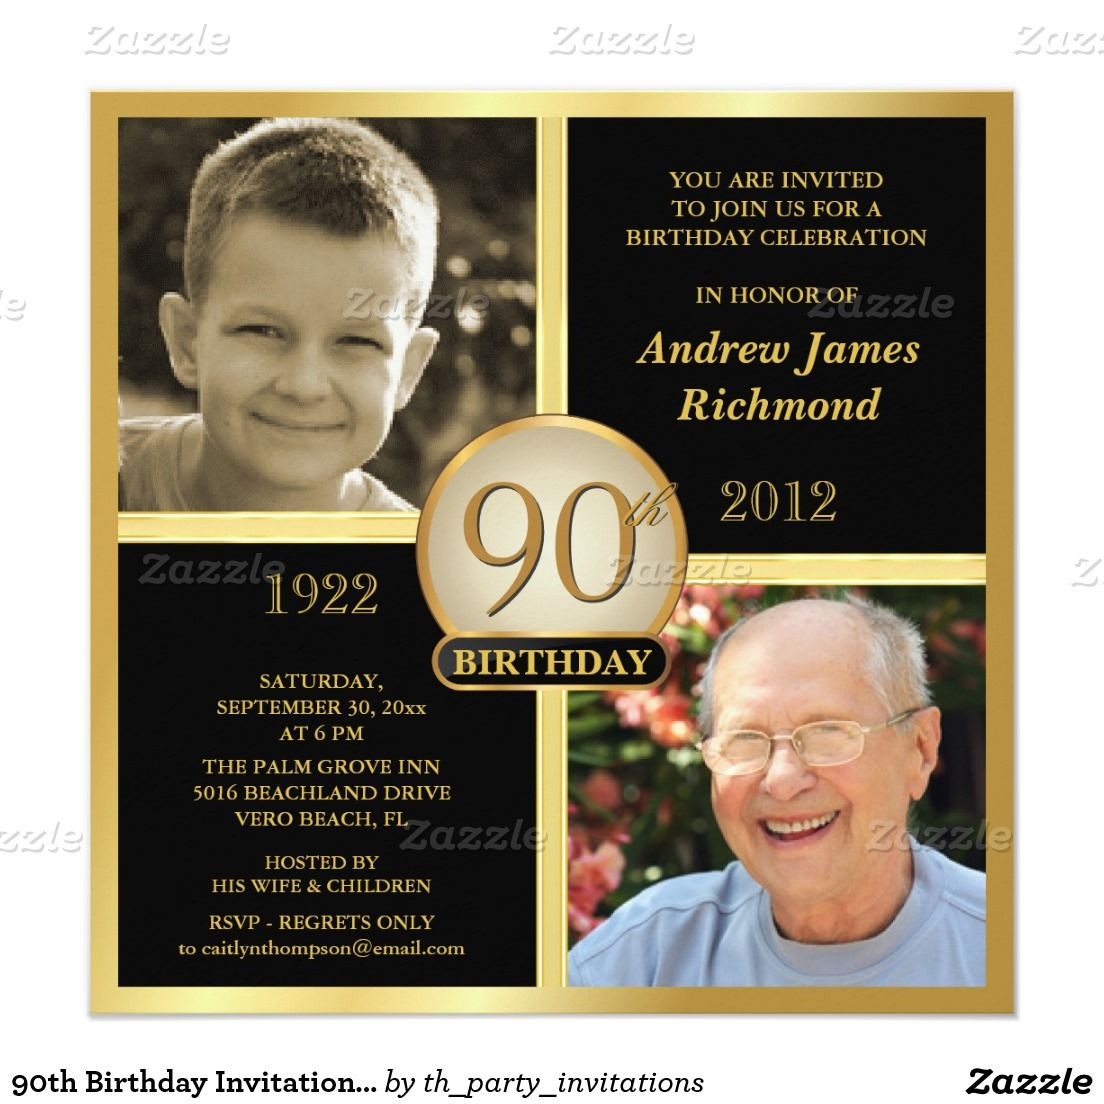 90th Birthday Invitations Then Now 2 Photos 525 Square Invitation Card